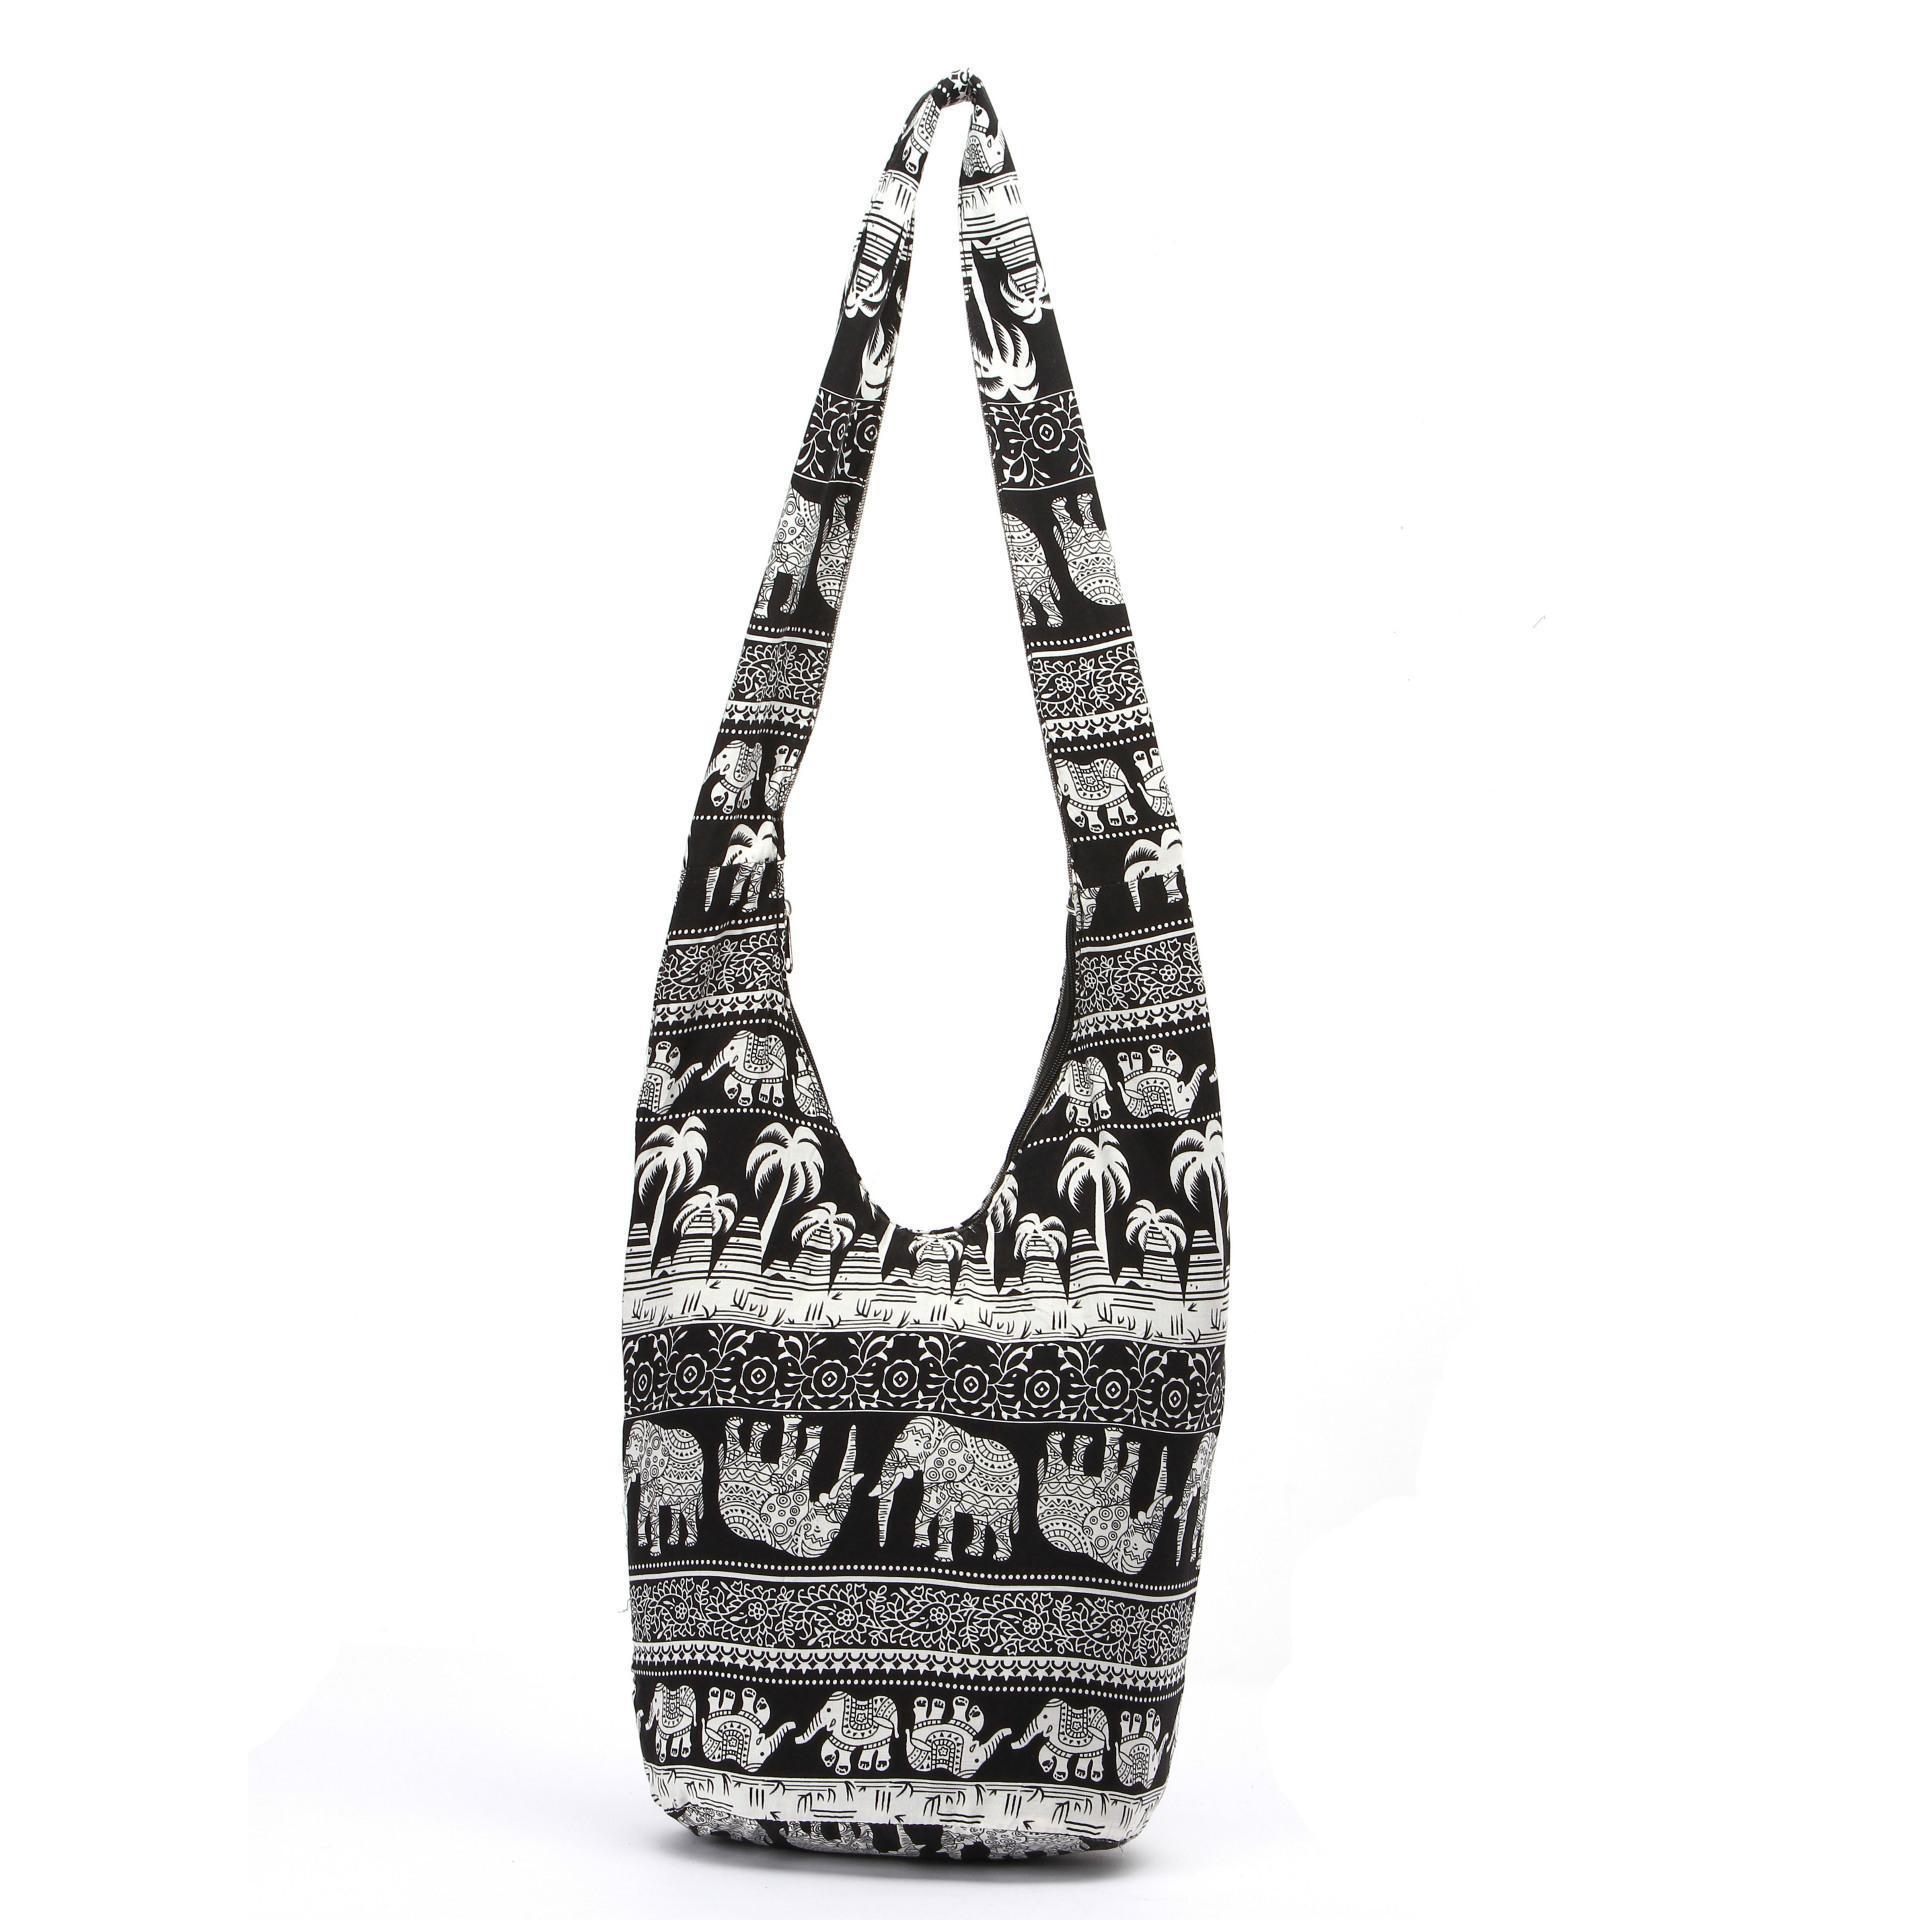 63905e8956 Cotton Canvas Hippie Crossbody Cross Body Bag Thai Top Zip Hobo Sling Bag  Handmade Hipster Messenger Zipper Bag White Handbags Satchel Handbags From  Yinkor